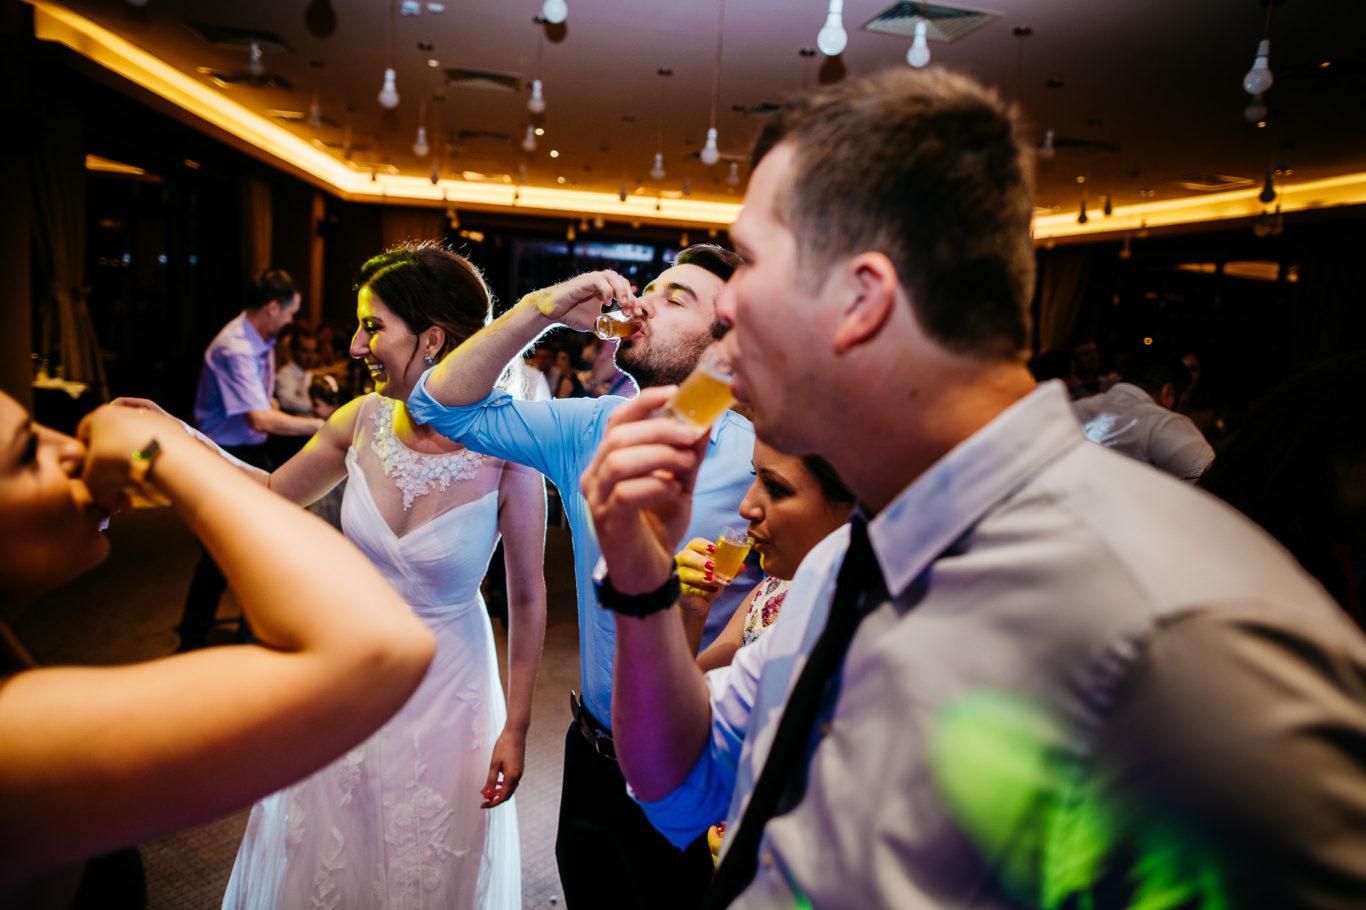 0848-Fotografie-nunta-Bucuresti-Oana-Catalin-fotograf-Ciprian-Dumitrescu-DCF_3007